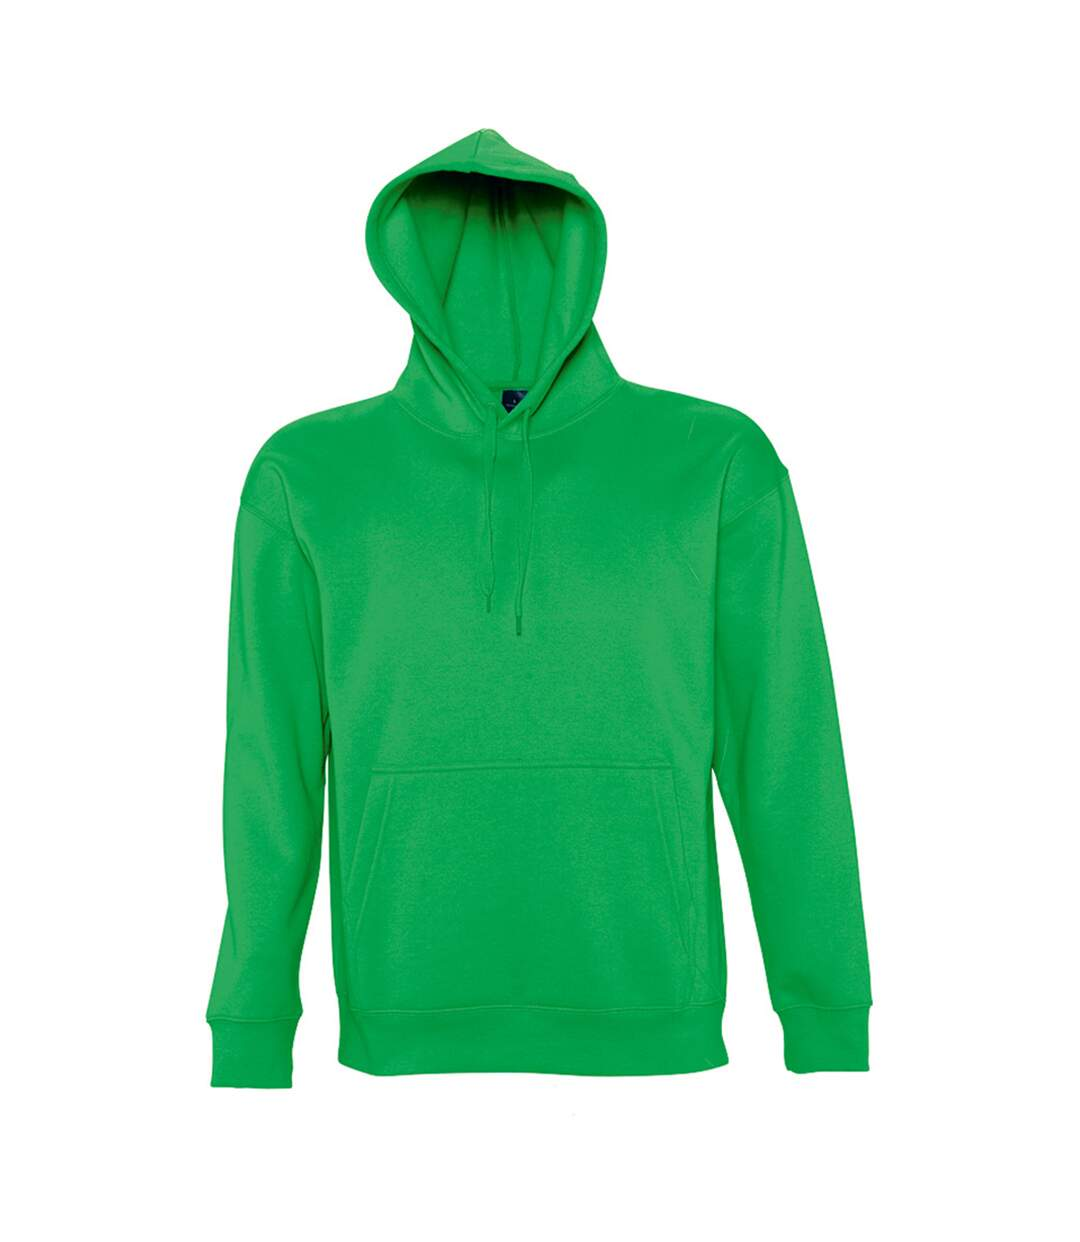 Sols Slam - Sweatshirt À Capuche - Homme (Vert tendre) - UTPC381